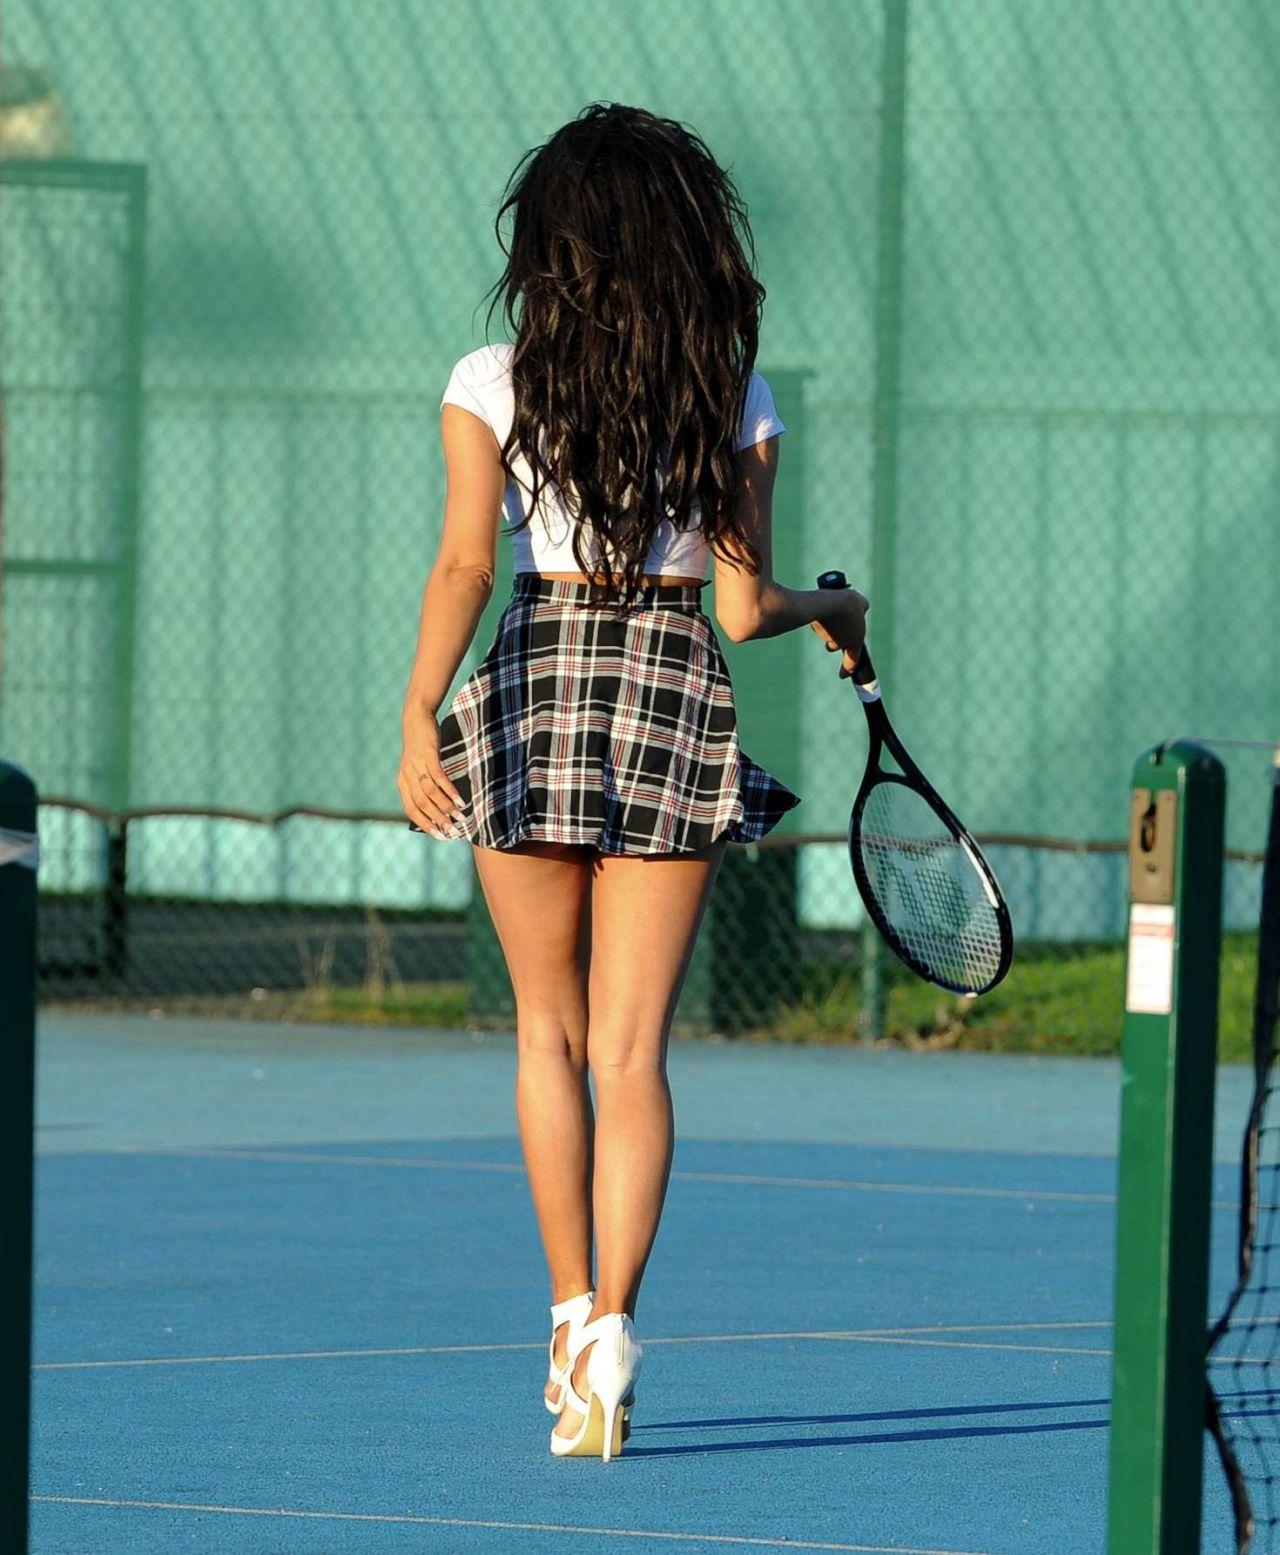 Chloe Khan Playing Tennis Manchester 10 15 2016